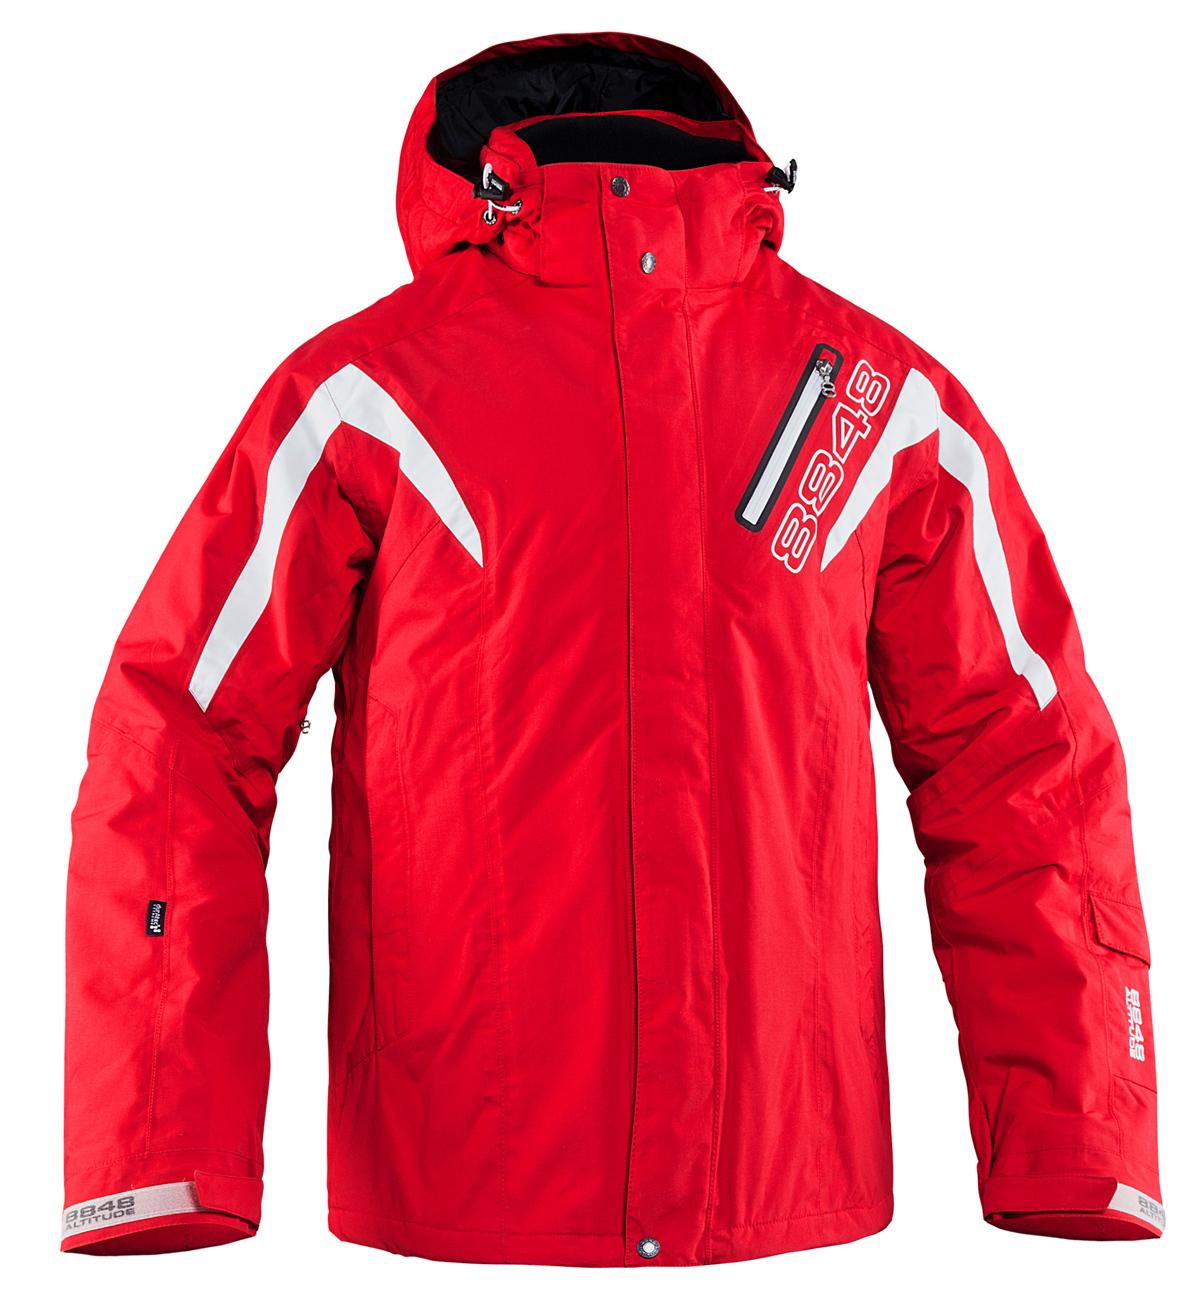 Горнолыжная куртка 8848 Altitude Phantom Red